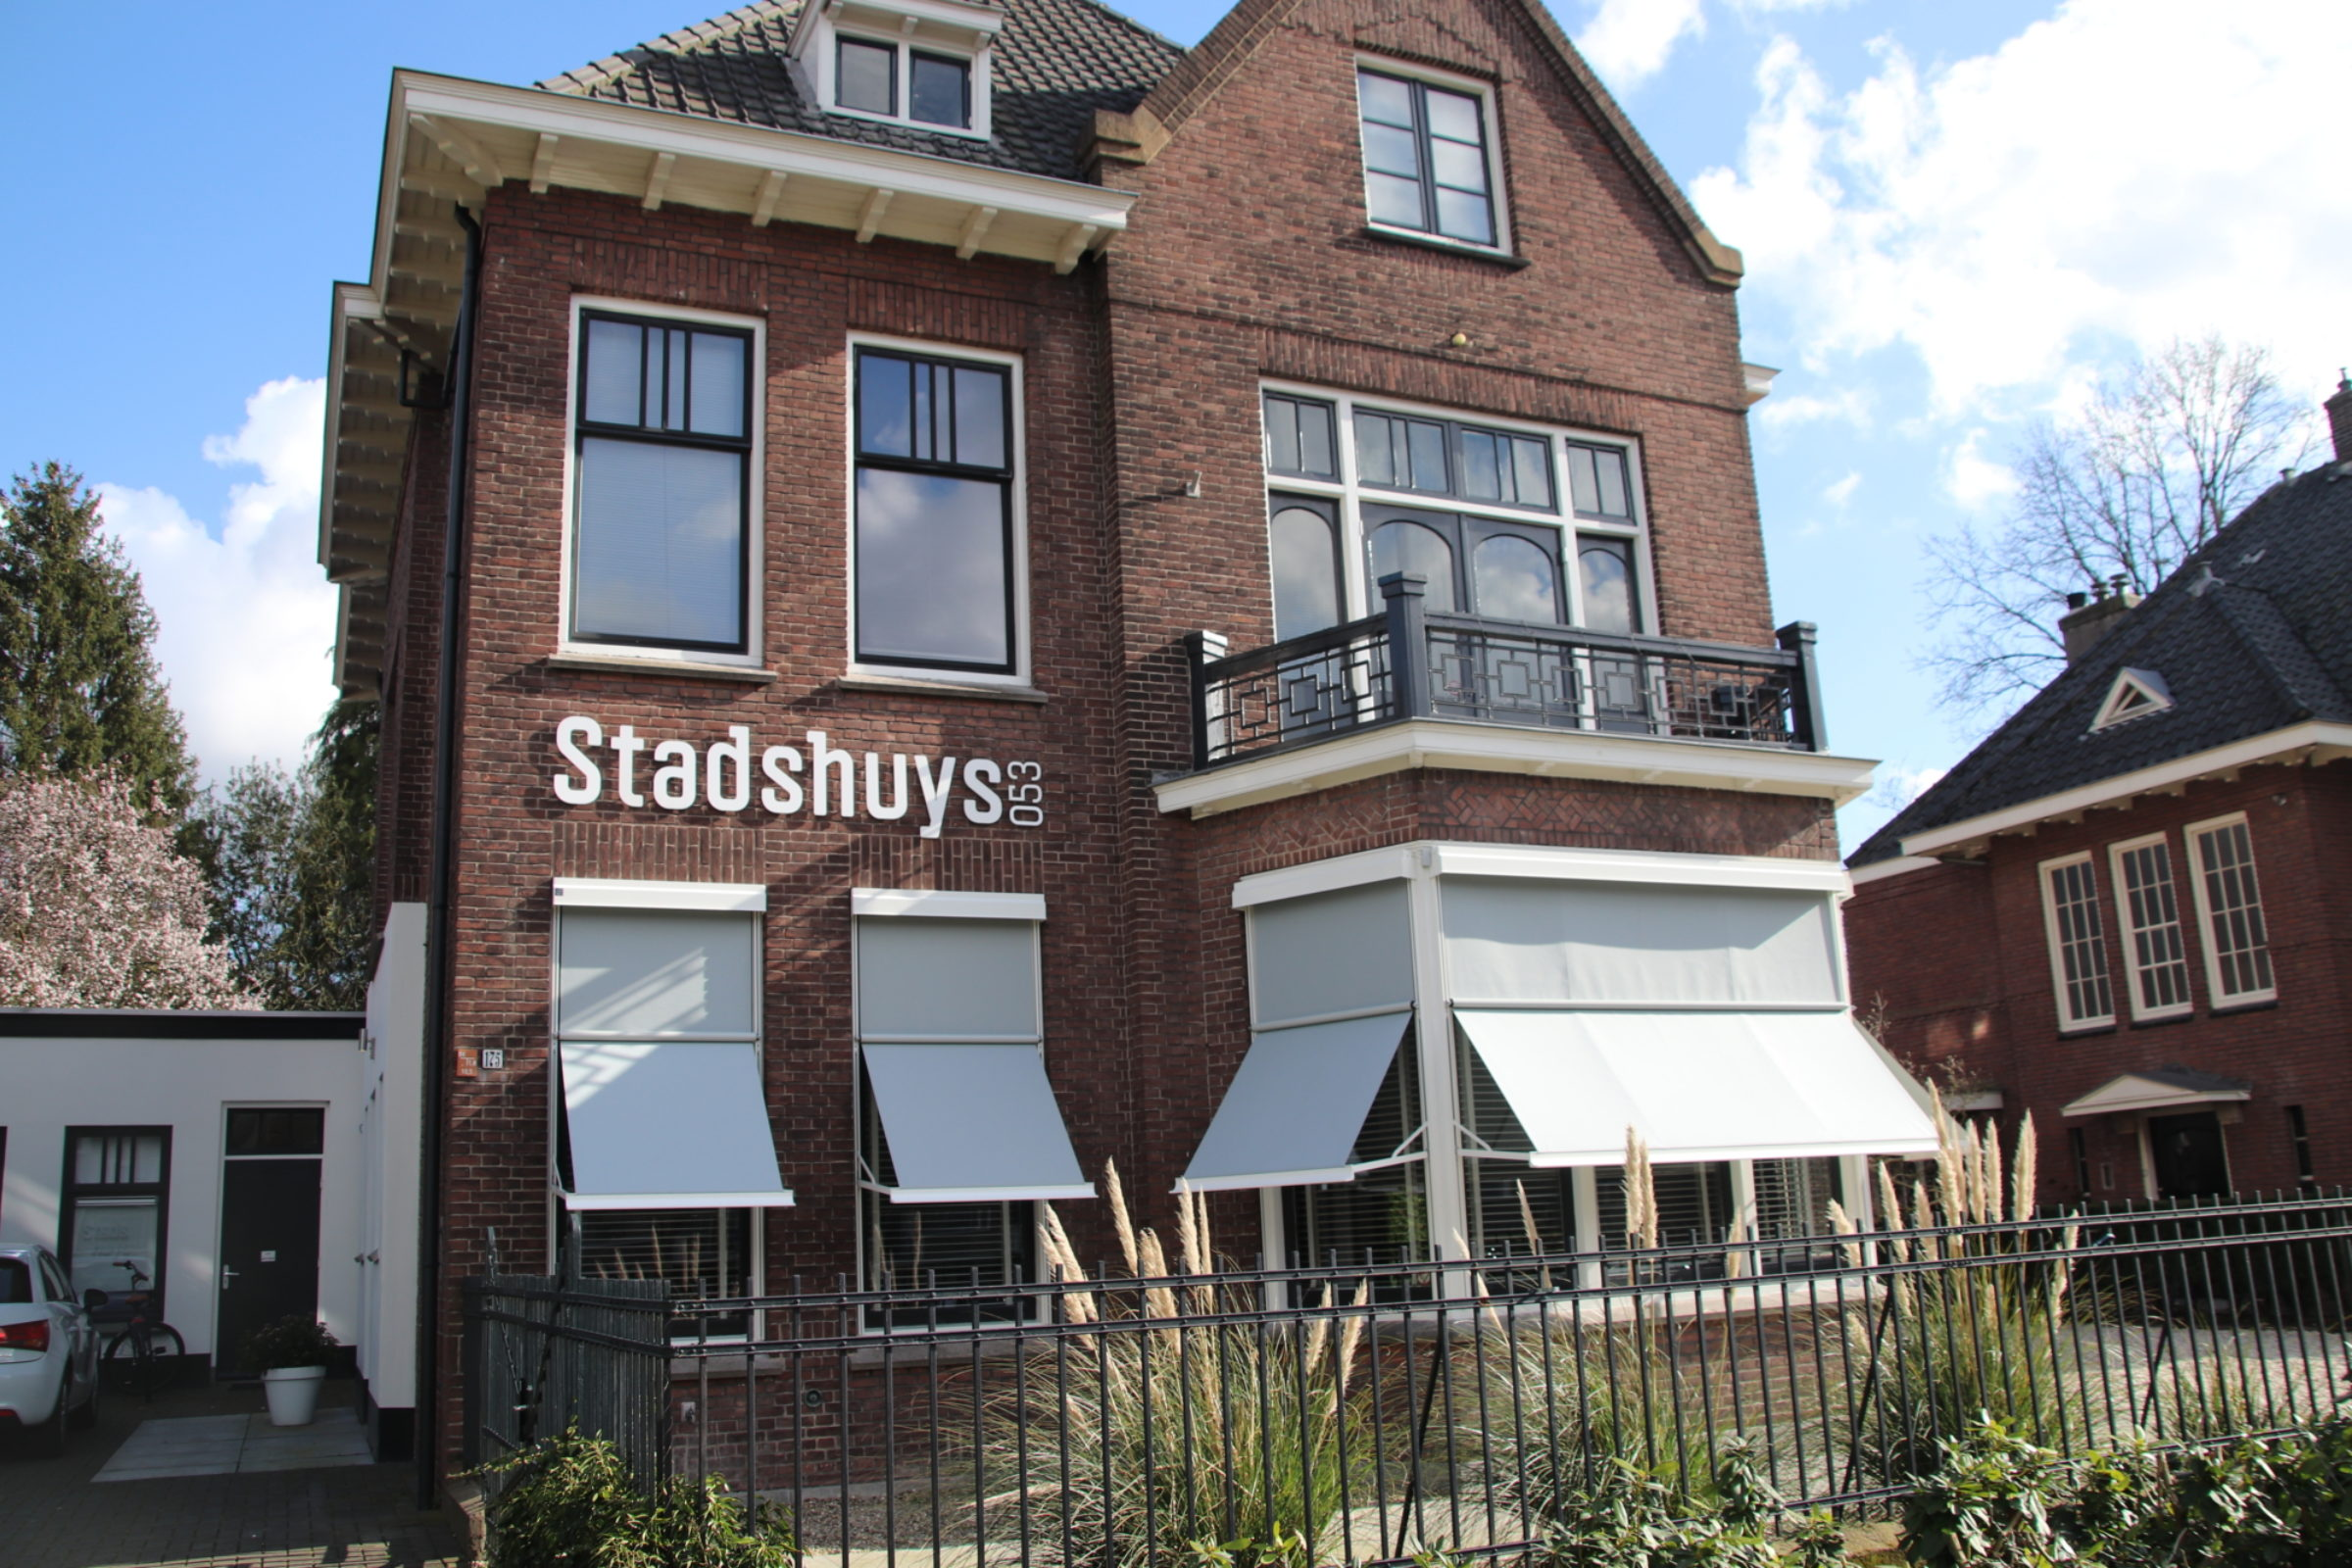 Studio Stadshuys053 Enschede 3